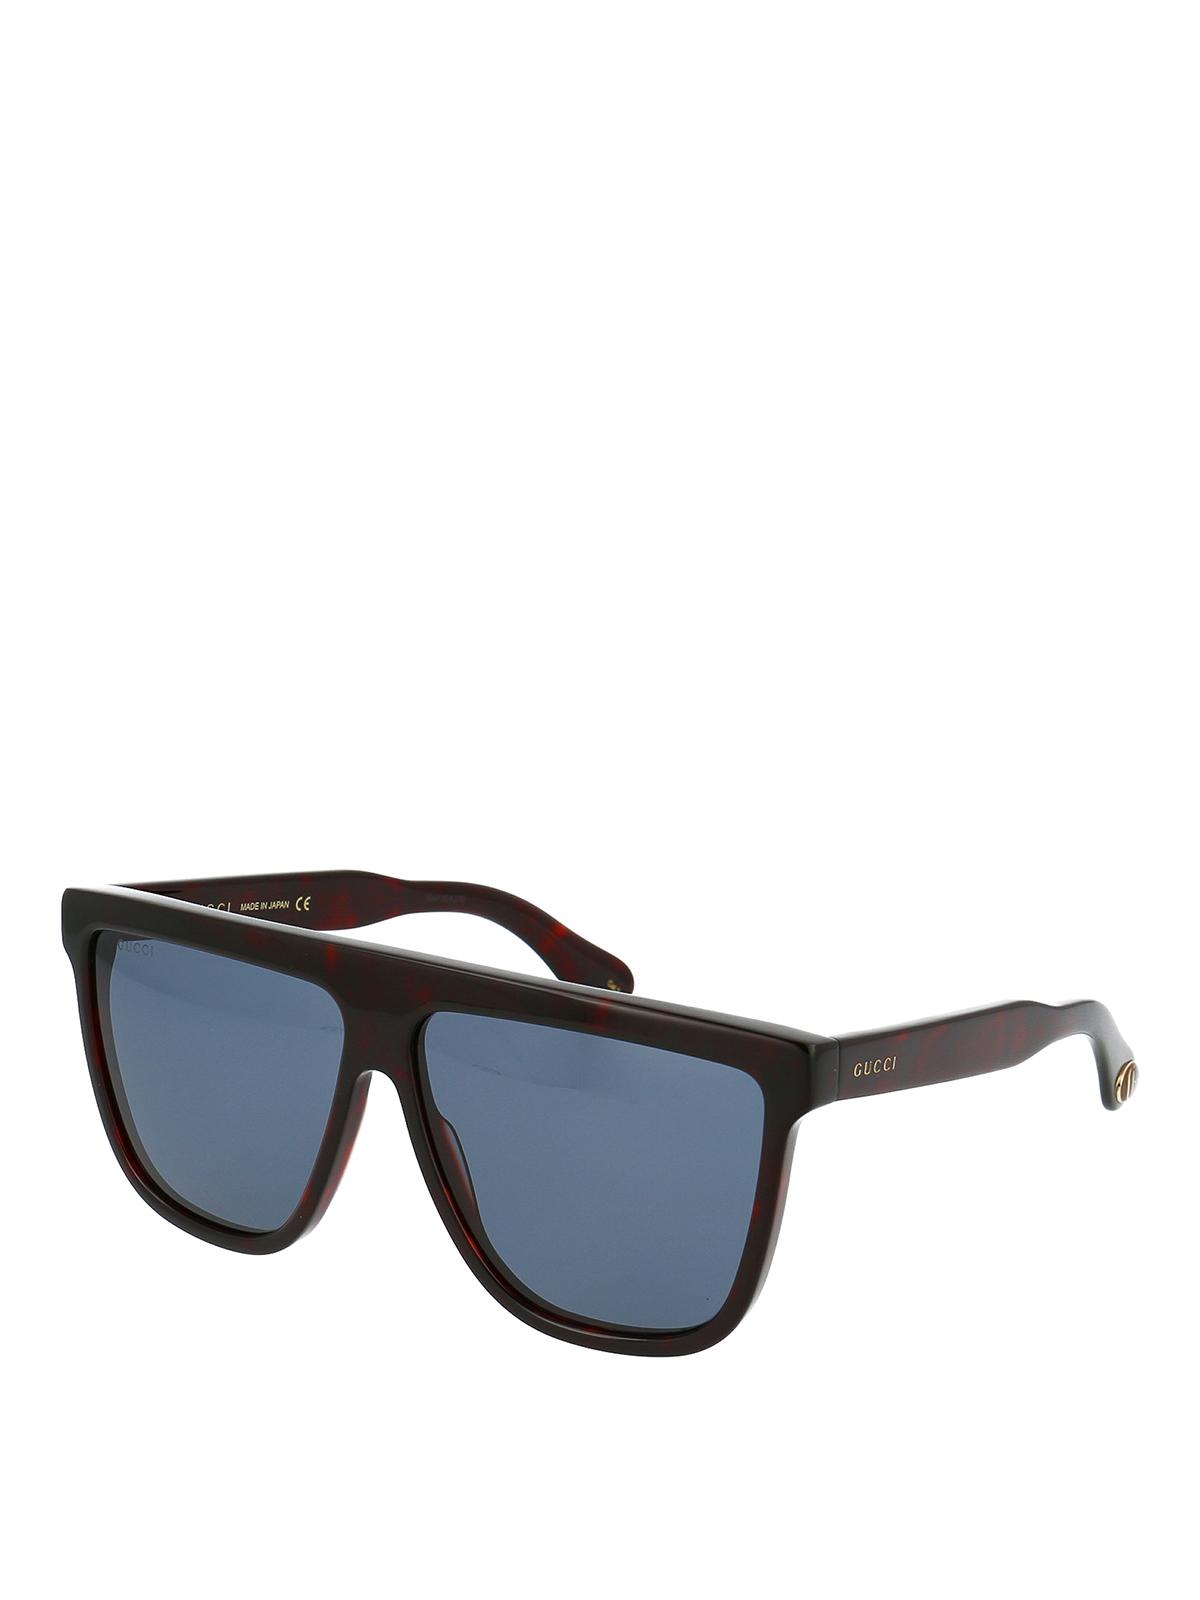 Gucci Dark Havana Wayfarer Sunglasses In Dark Brown